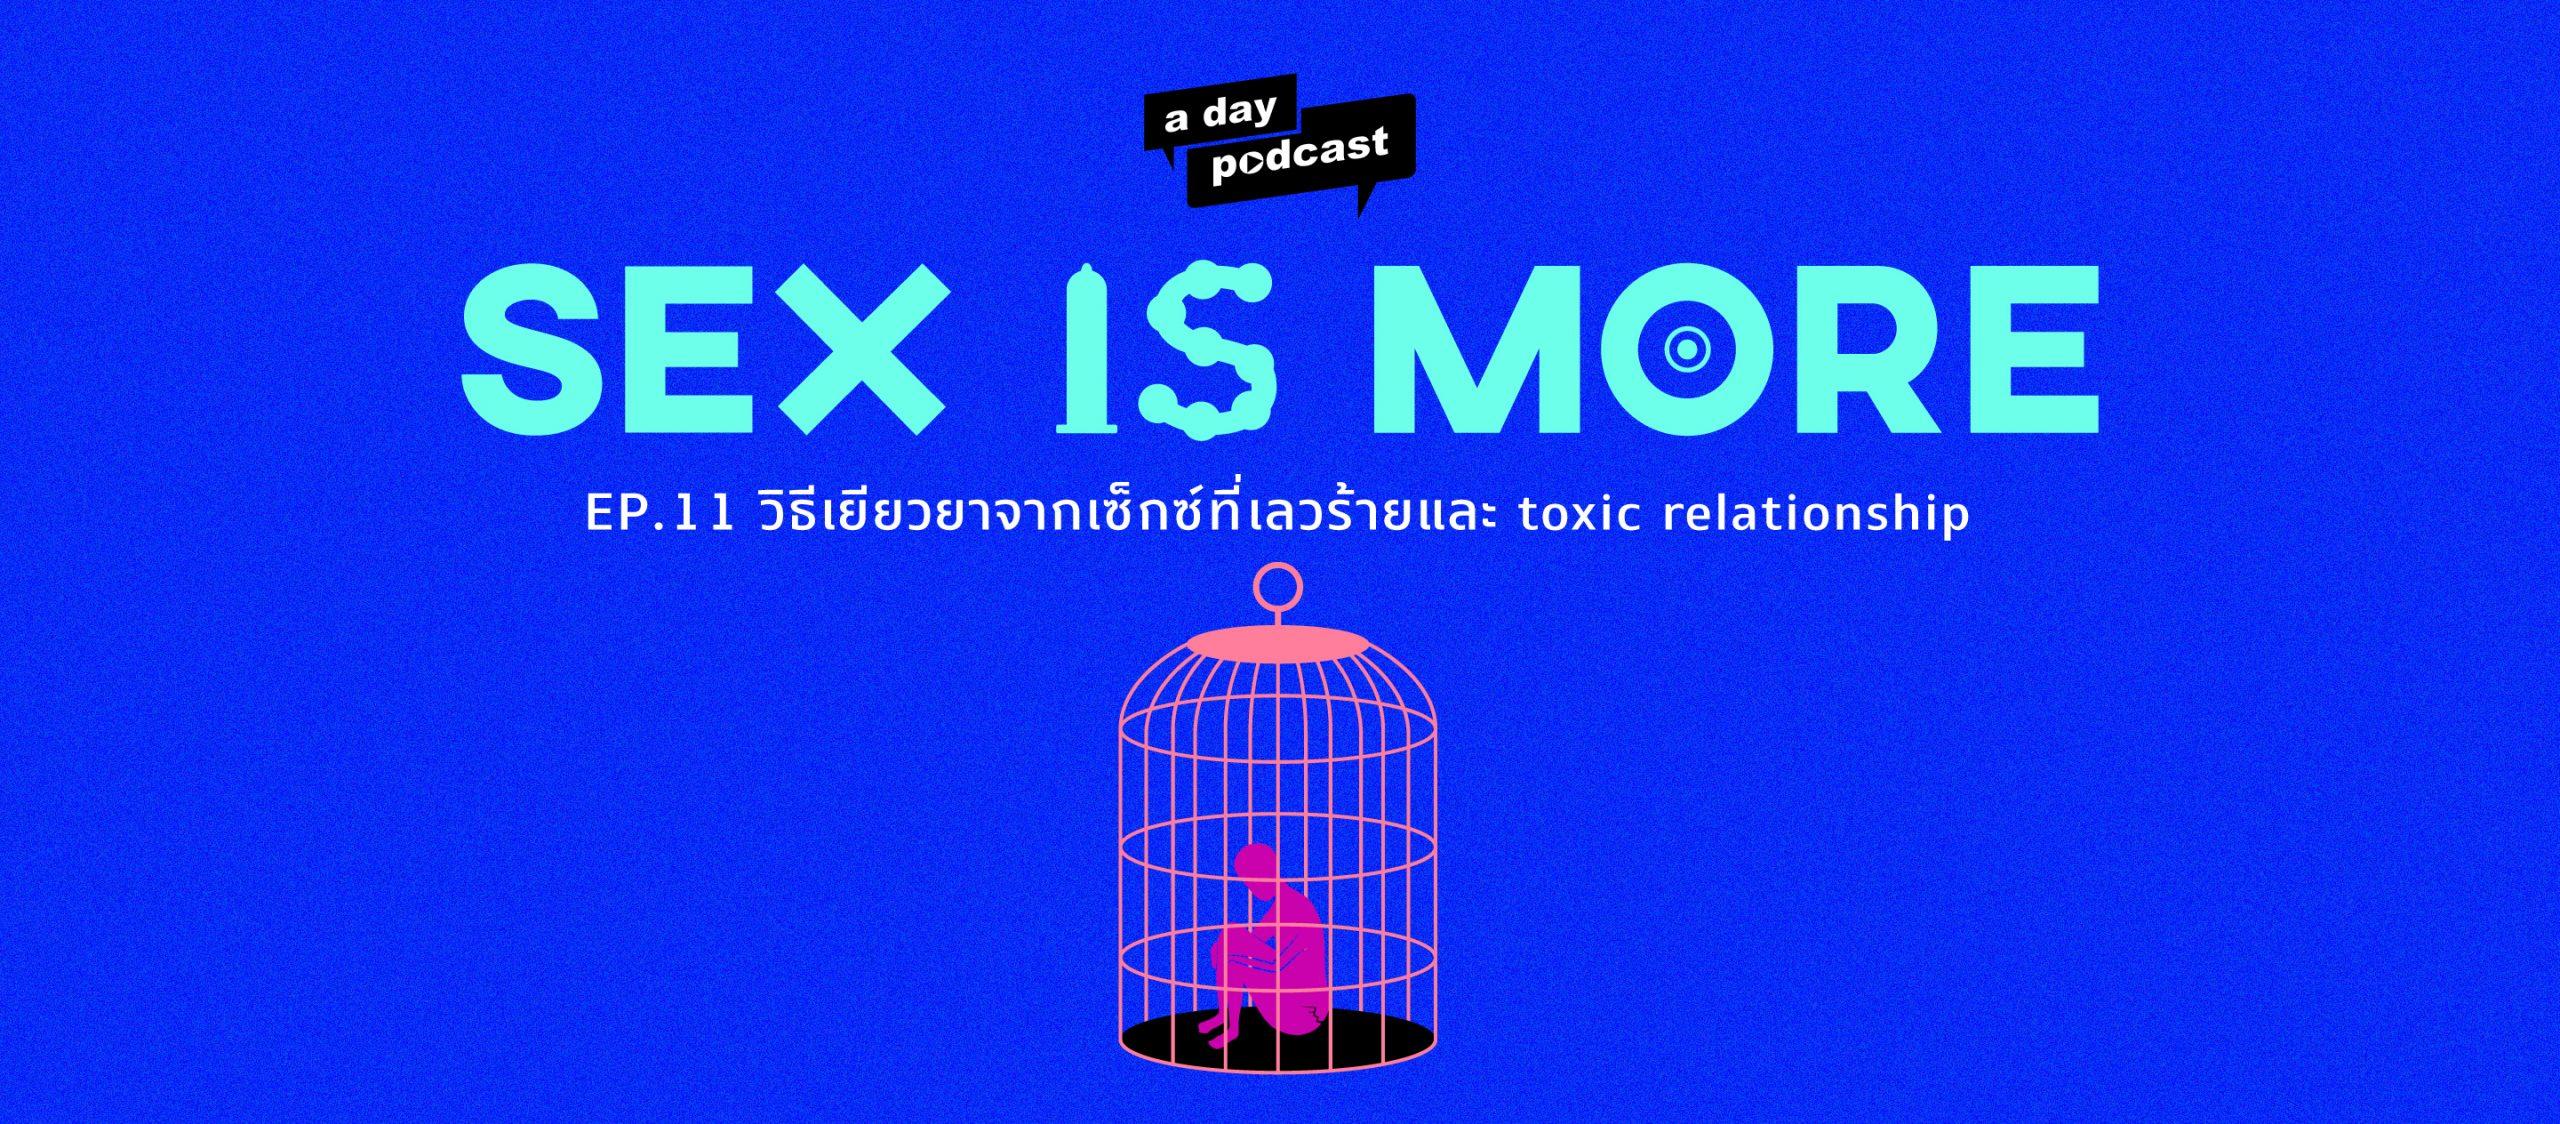 Sex is More EP.11 วิธีเยียวยาจากเซ็กซ์ที่เลวร้ายและ toxic relationship